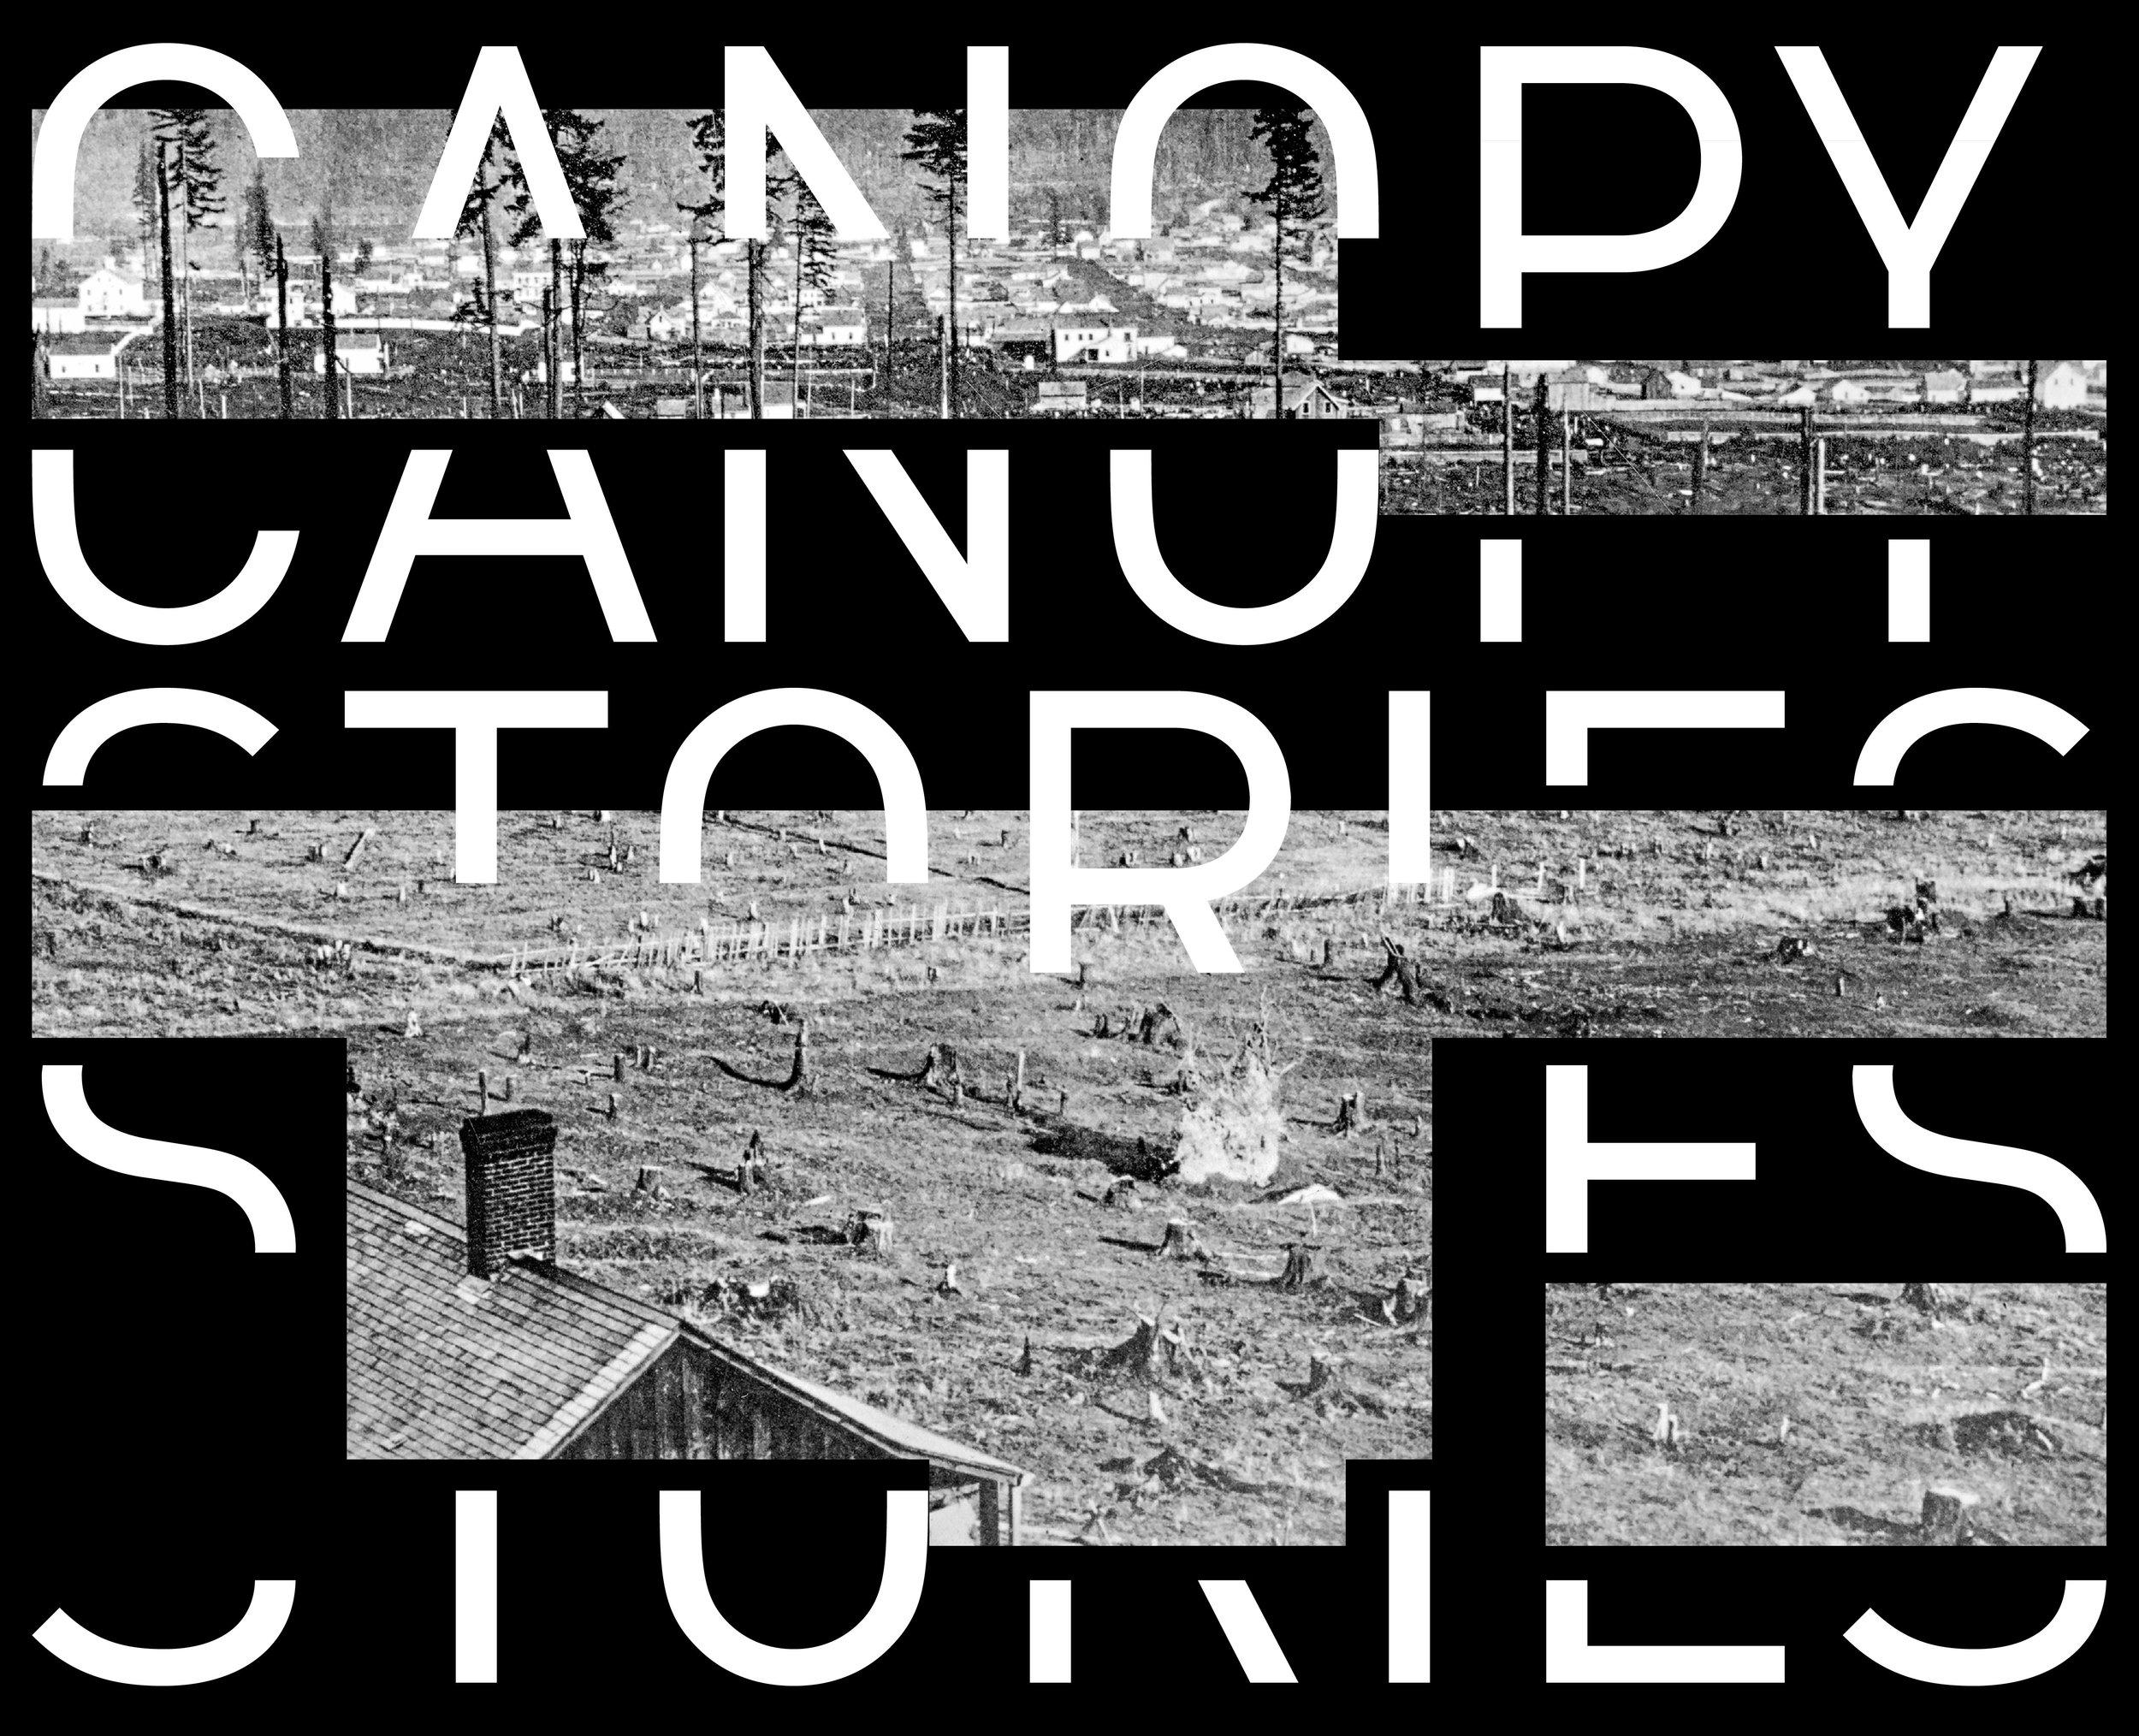 CanopyStories-LandingPage-Mobile-04.jpg